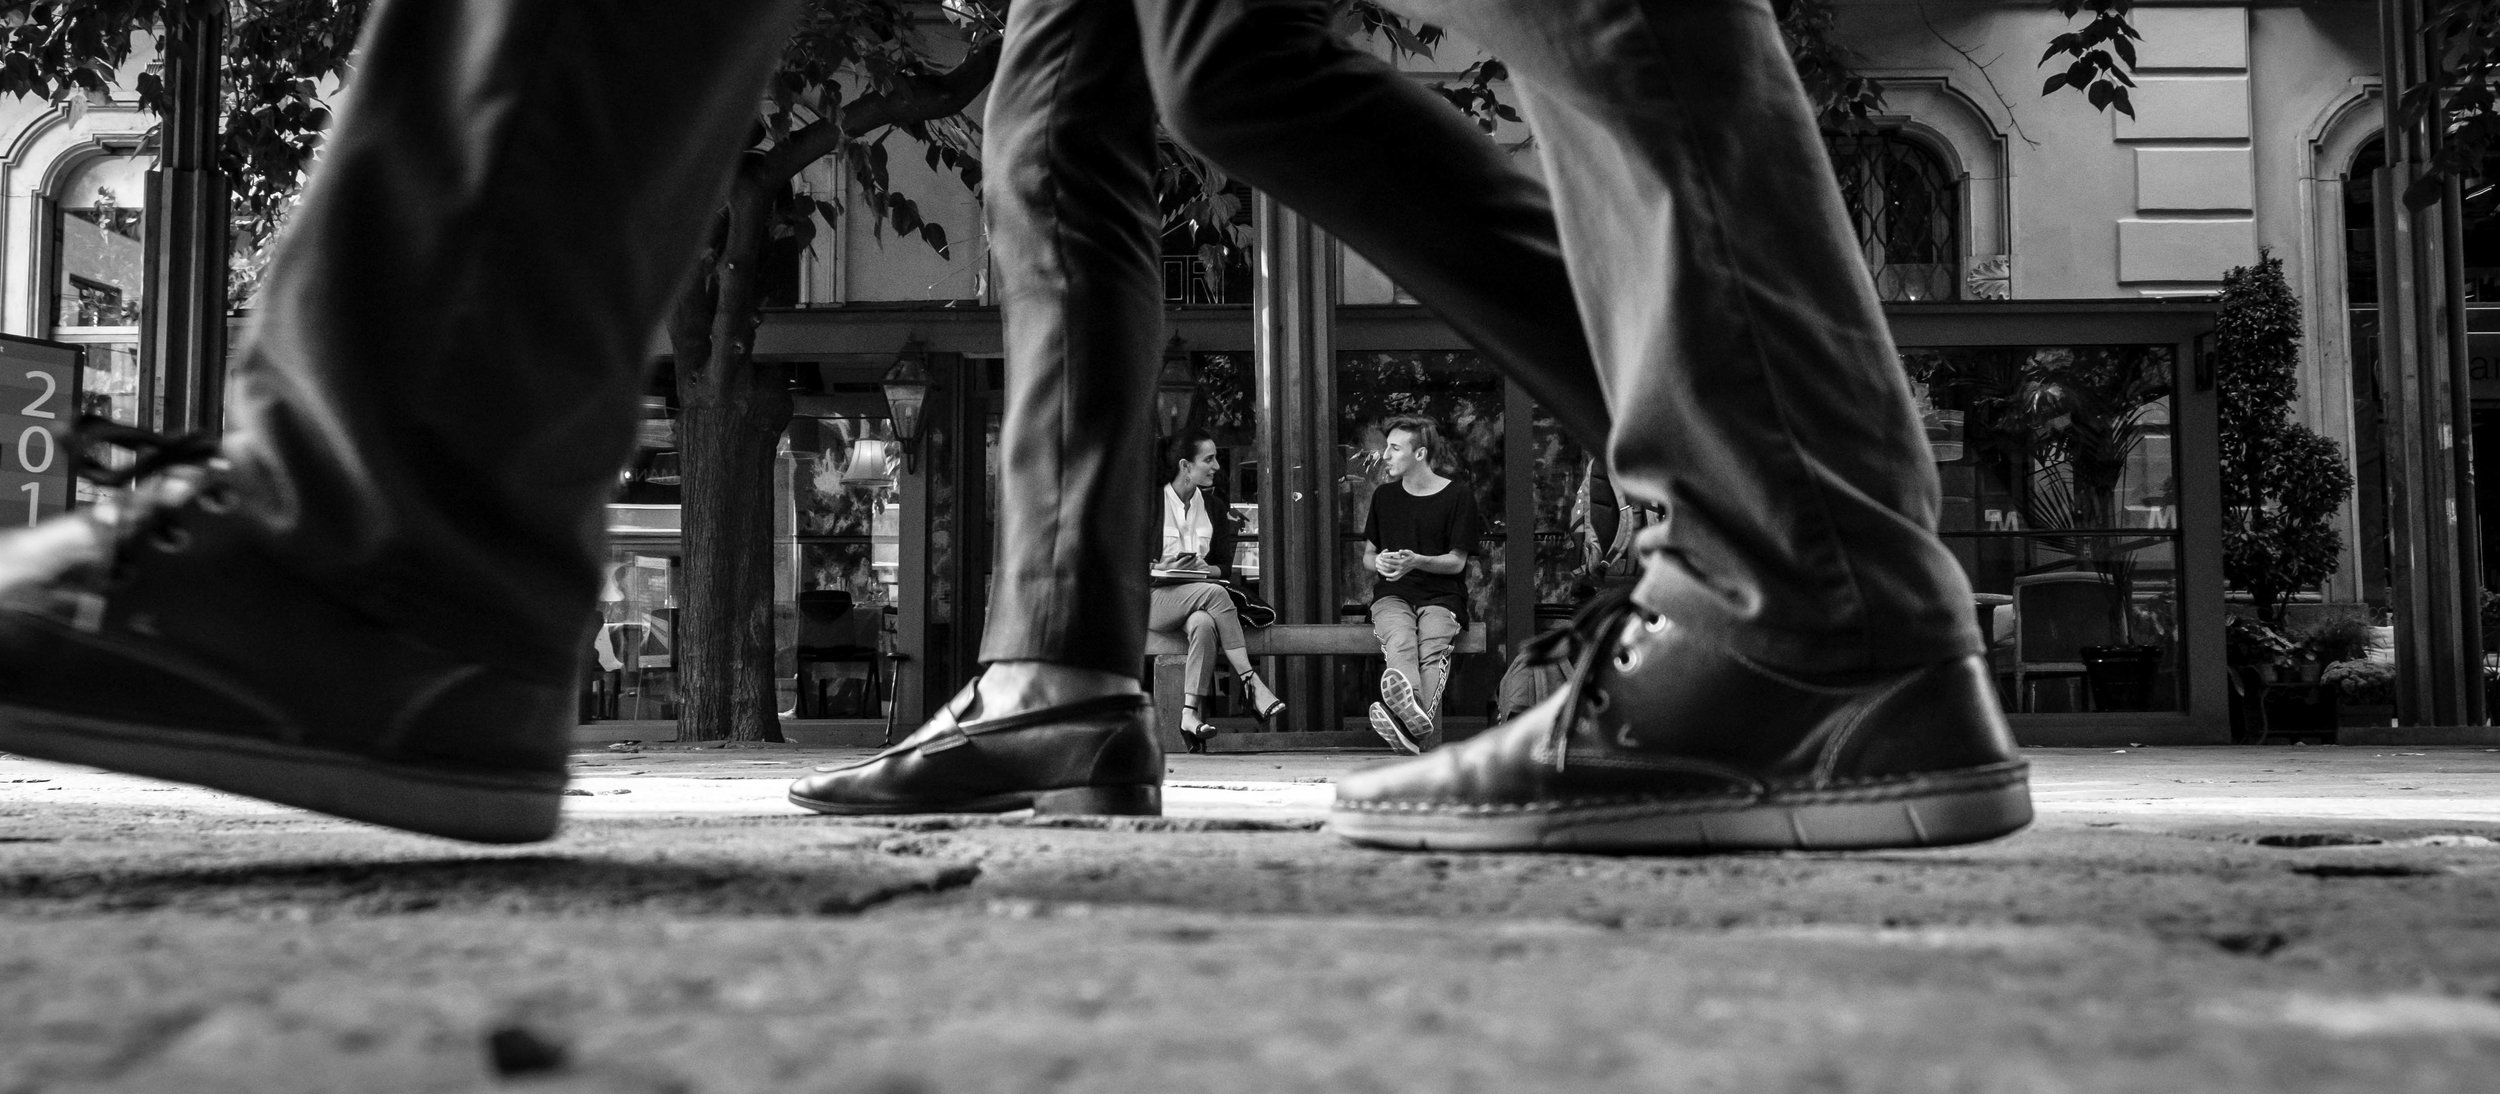 PHOTOGRAPHY: Mirko Fin • Fujifilm X-T2 • XF18-55mm Ƒ/2.8-4 R LM OIS @ 20.5mm • Ƒ/6.4 • 1/500 • ISO 100